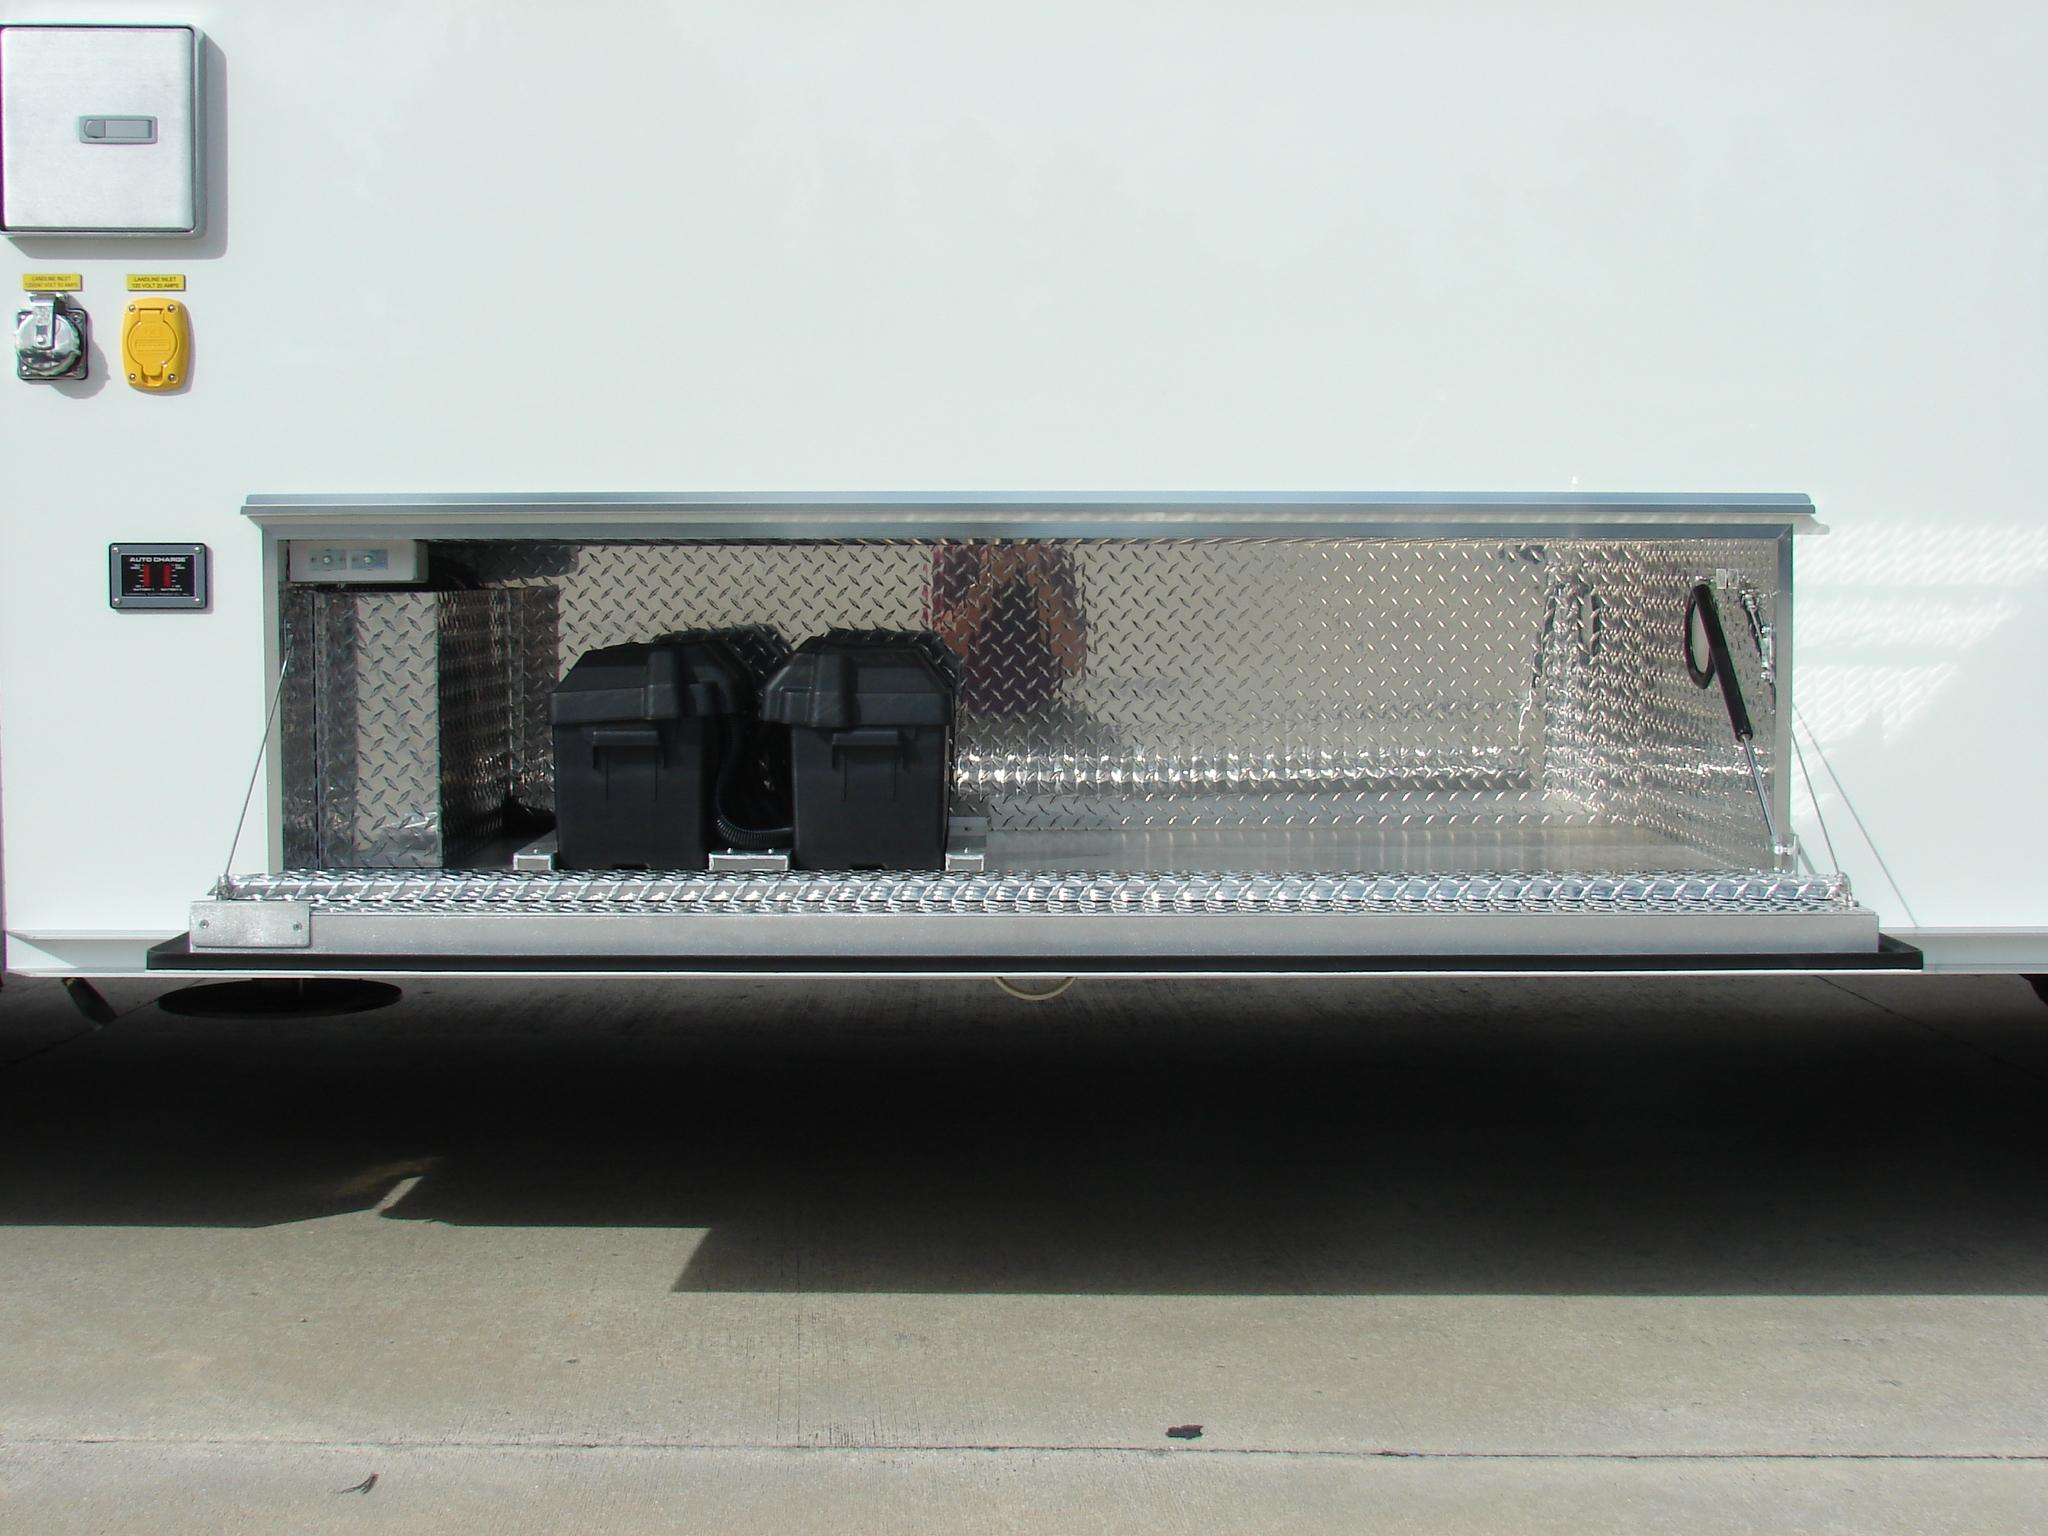 22-Ft. Tactical/SWAT Vehicle